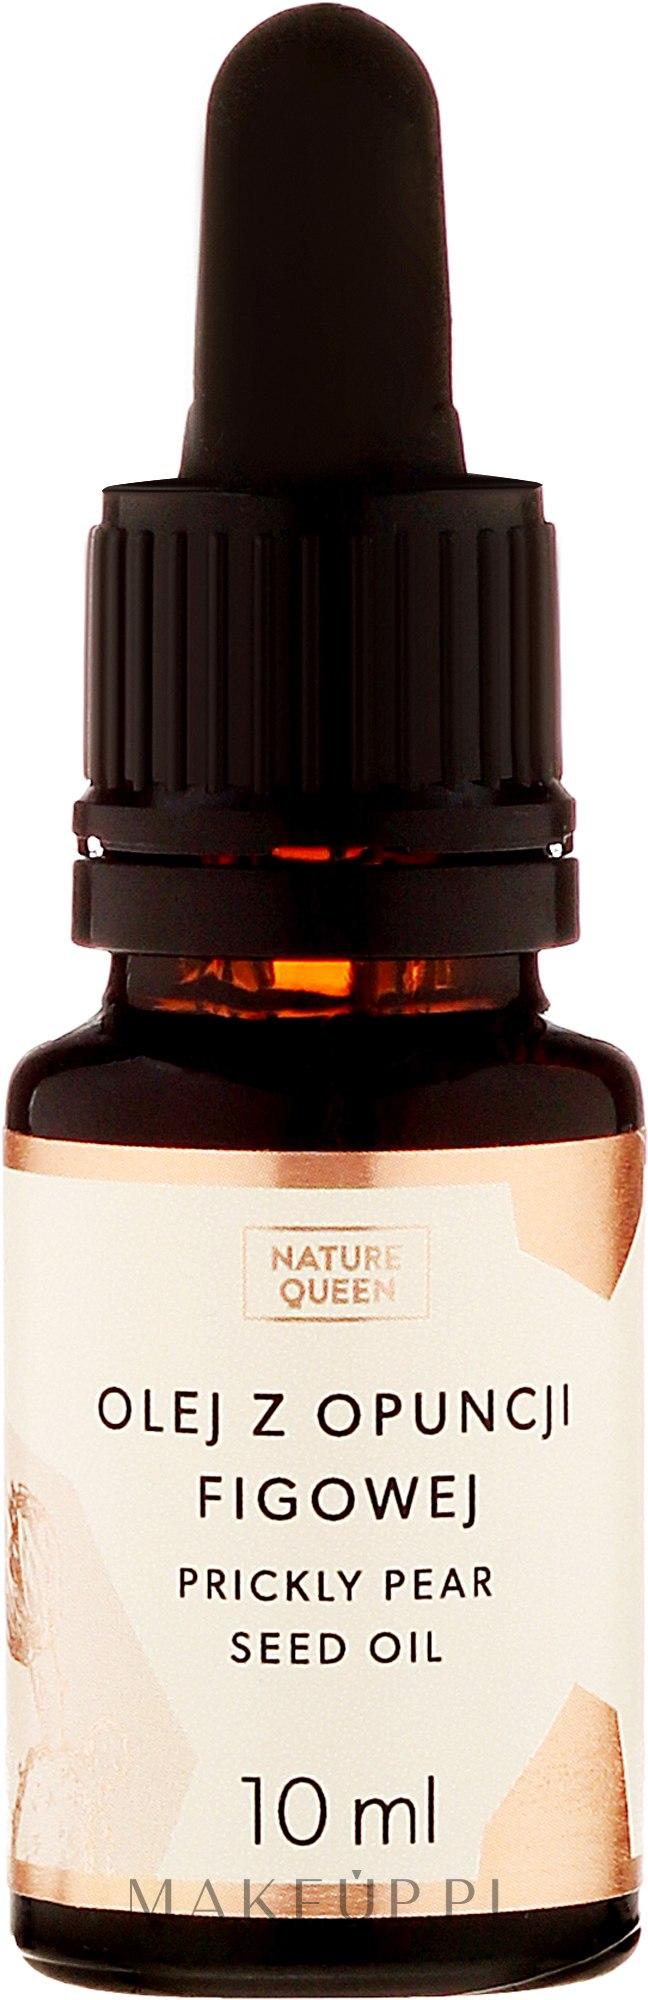 Olej z opuncji figowej - Nature Queen — фото 10 ml